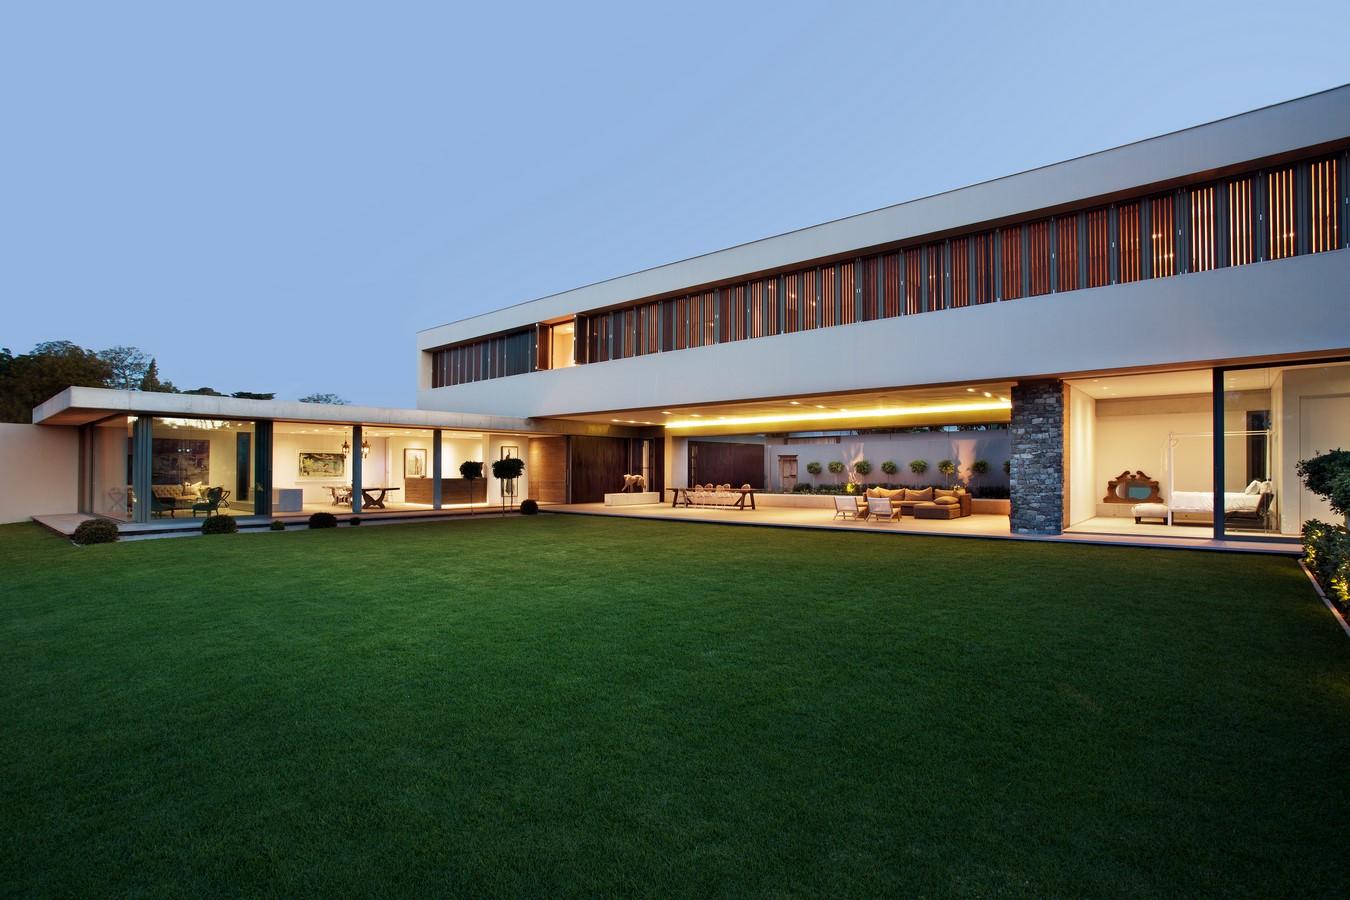 House 01 by Daffonchio and Associates Architects - Sheet1